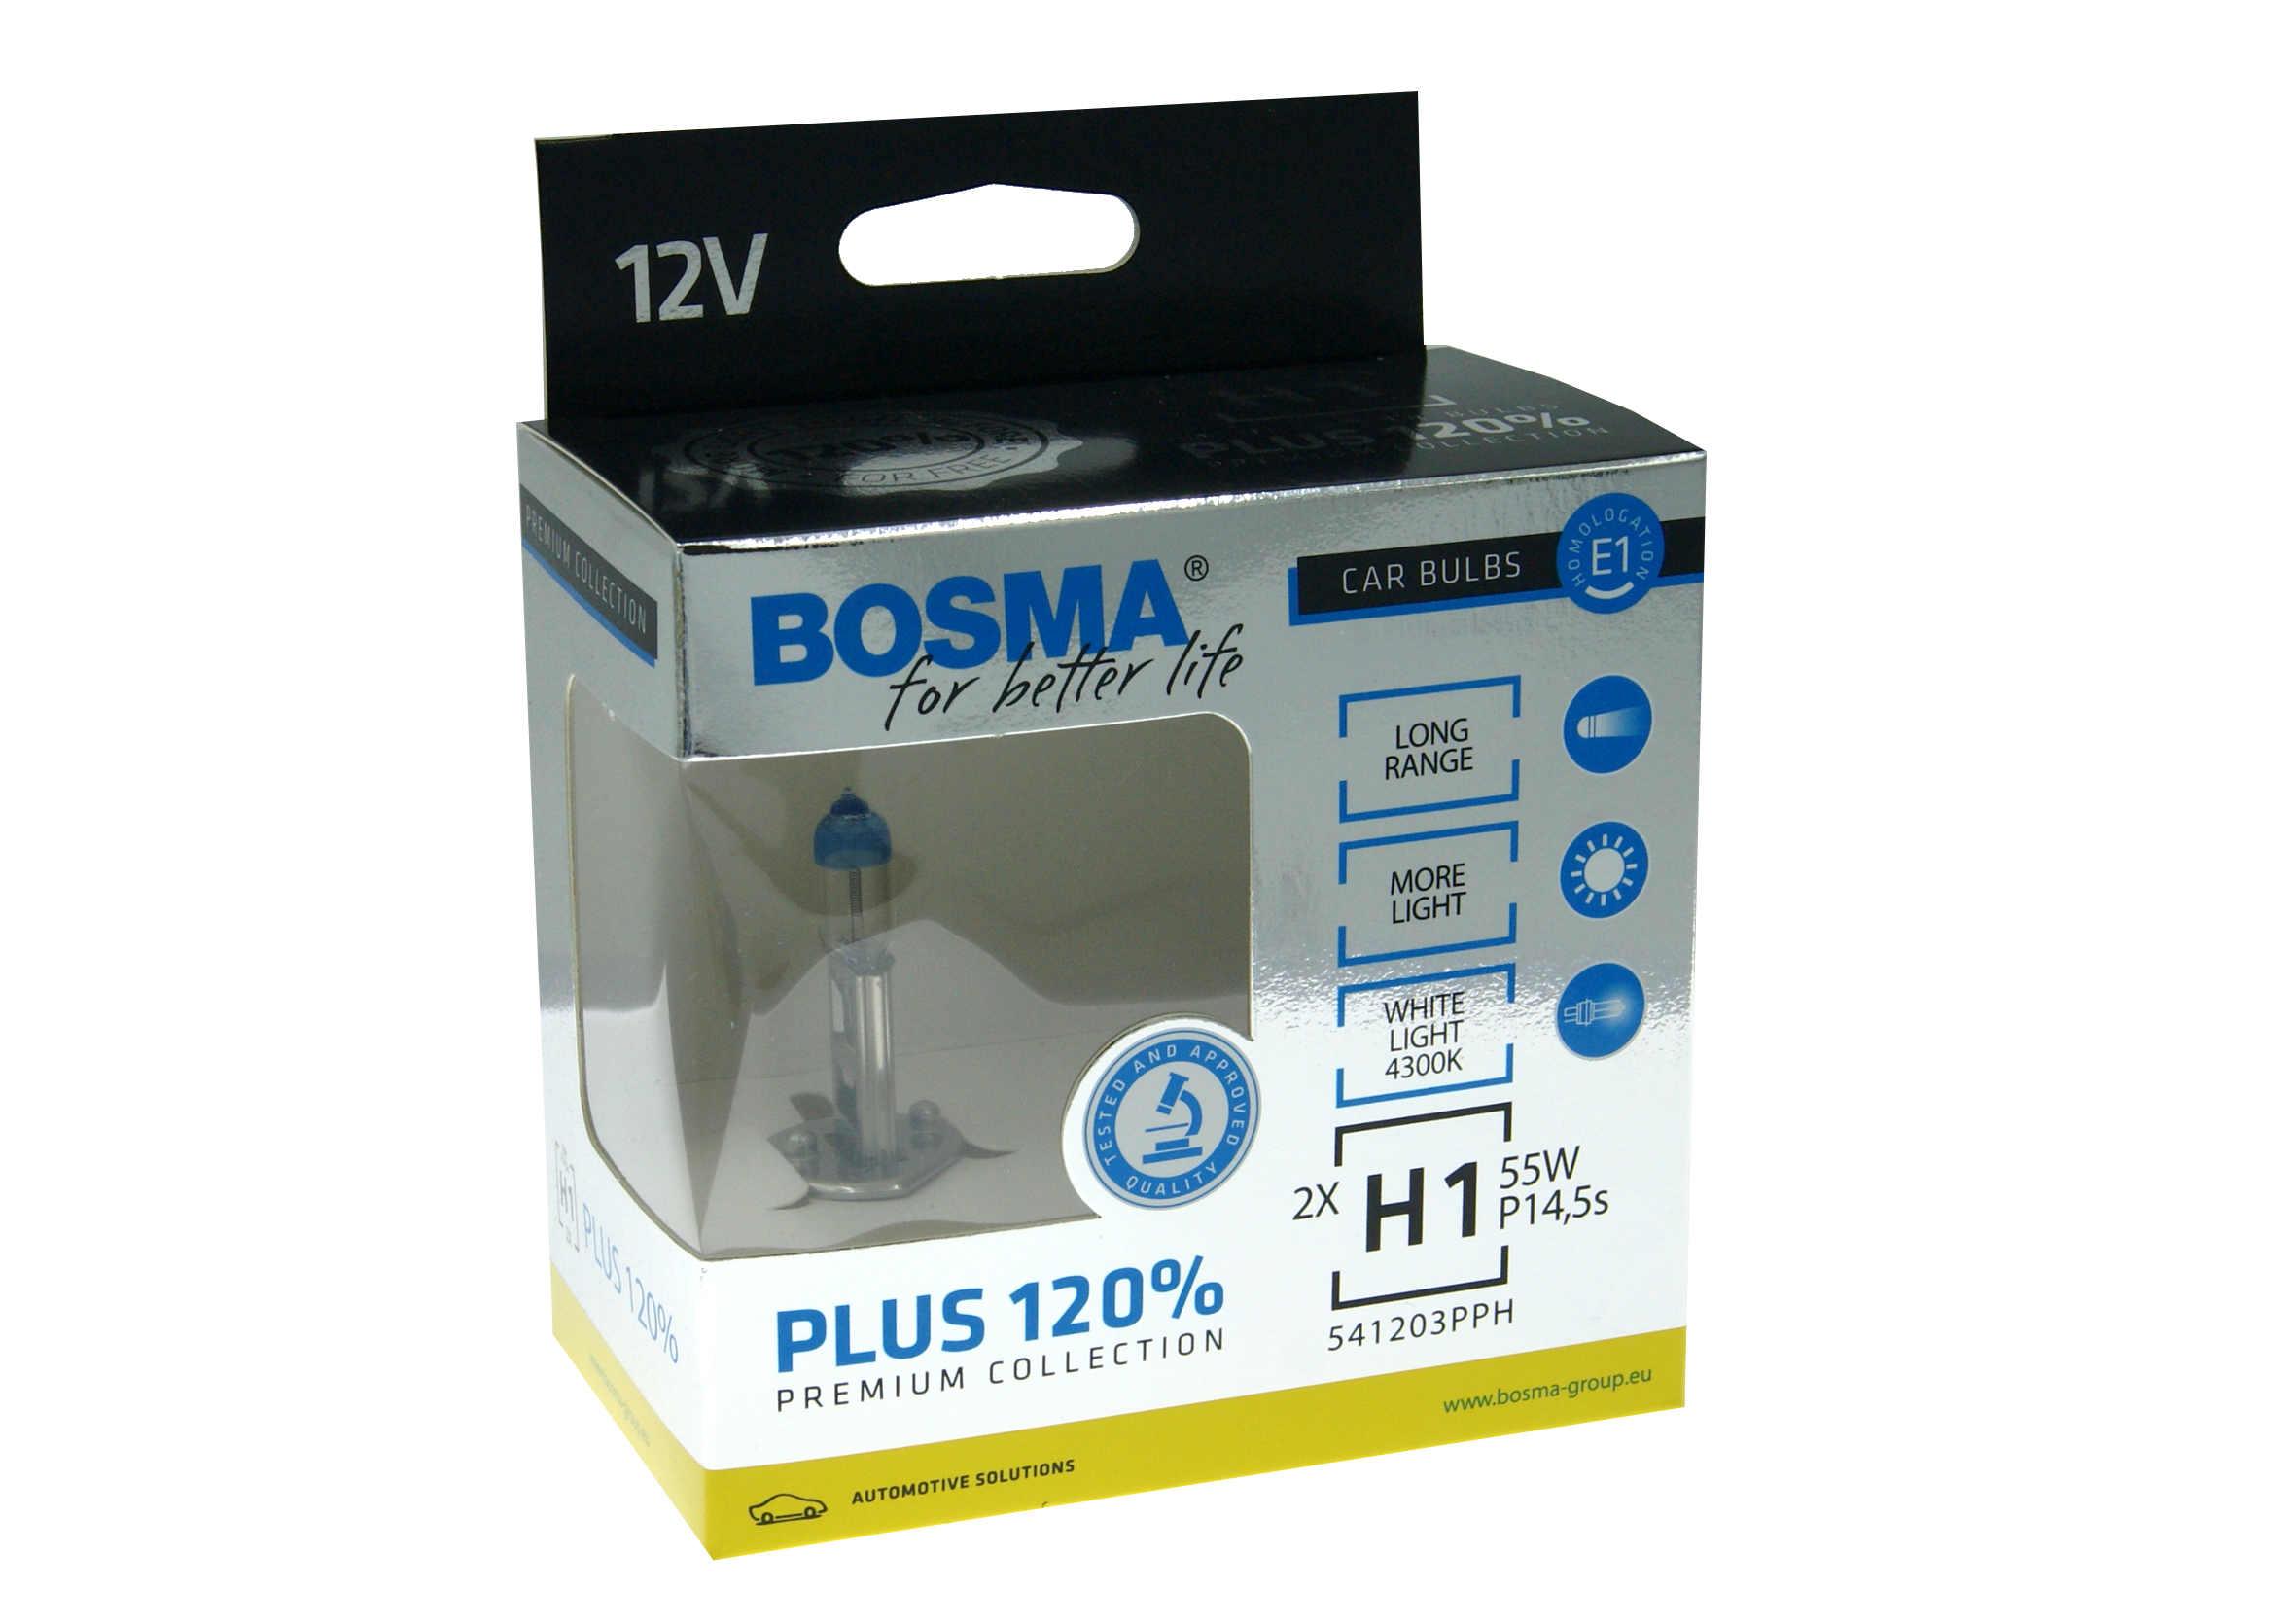 Bosma Premium Plus H1 120% 12V 55W Komplet Żarówek